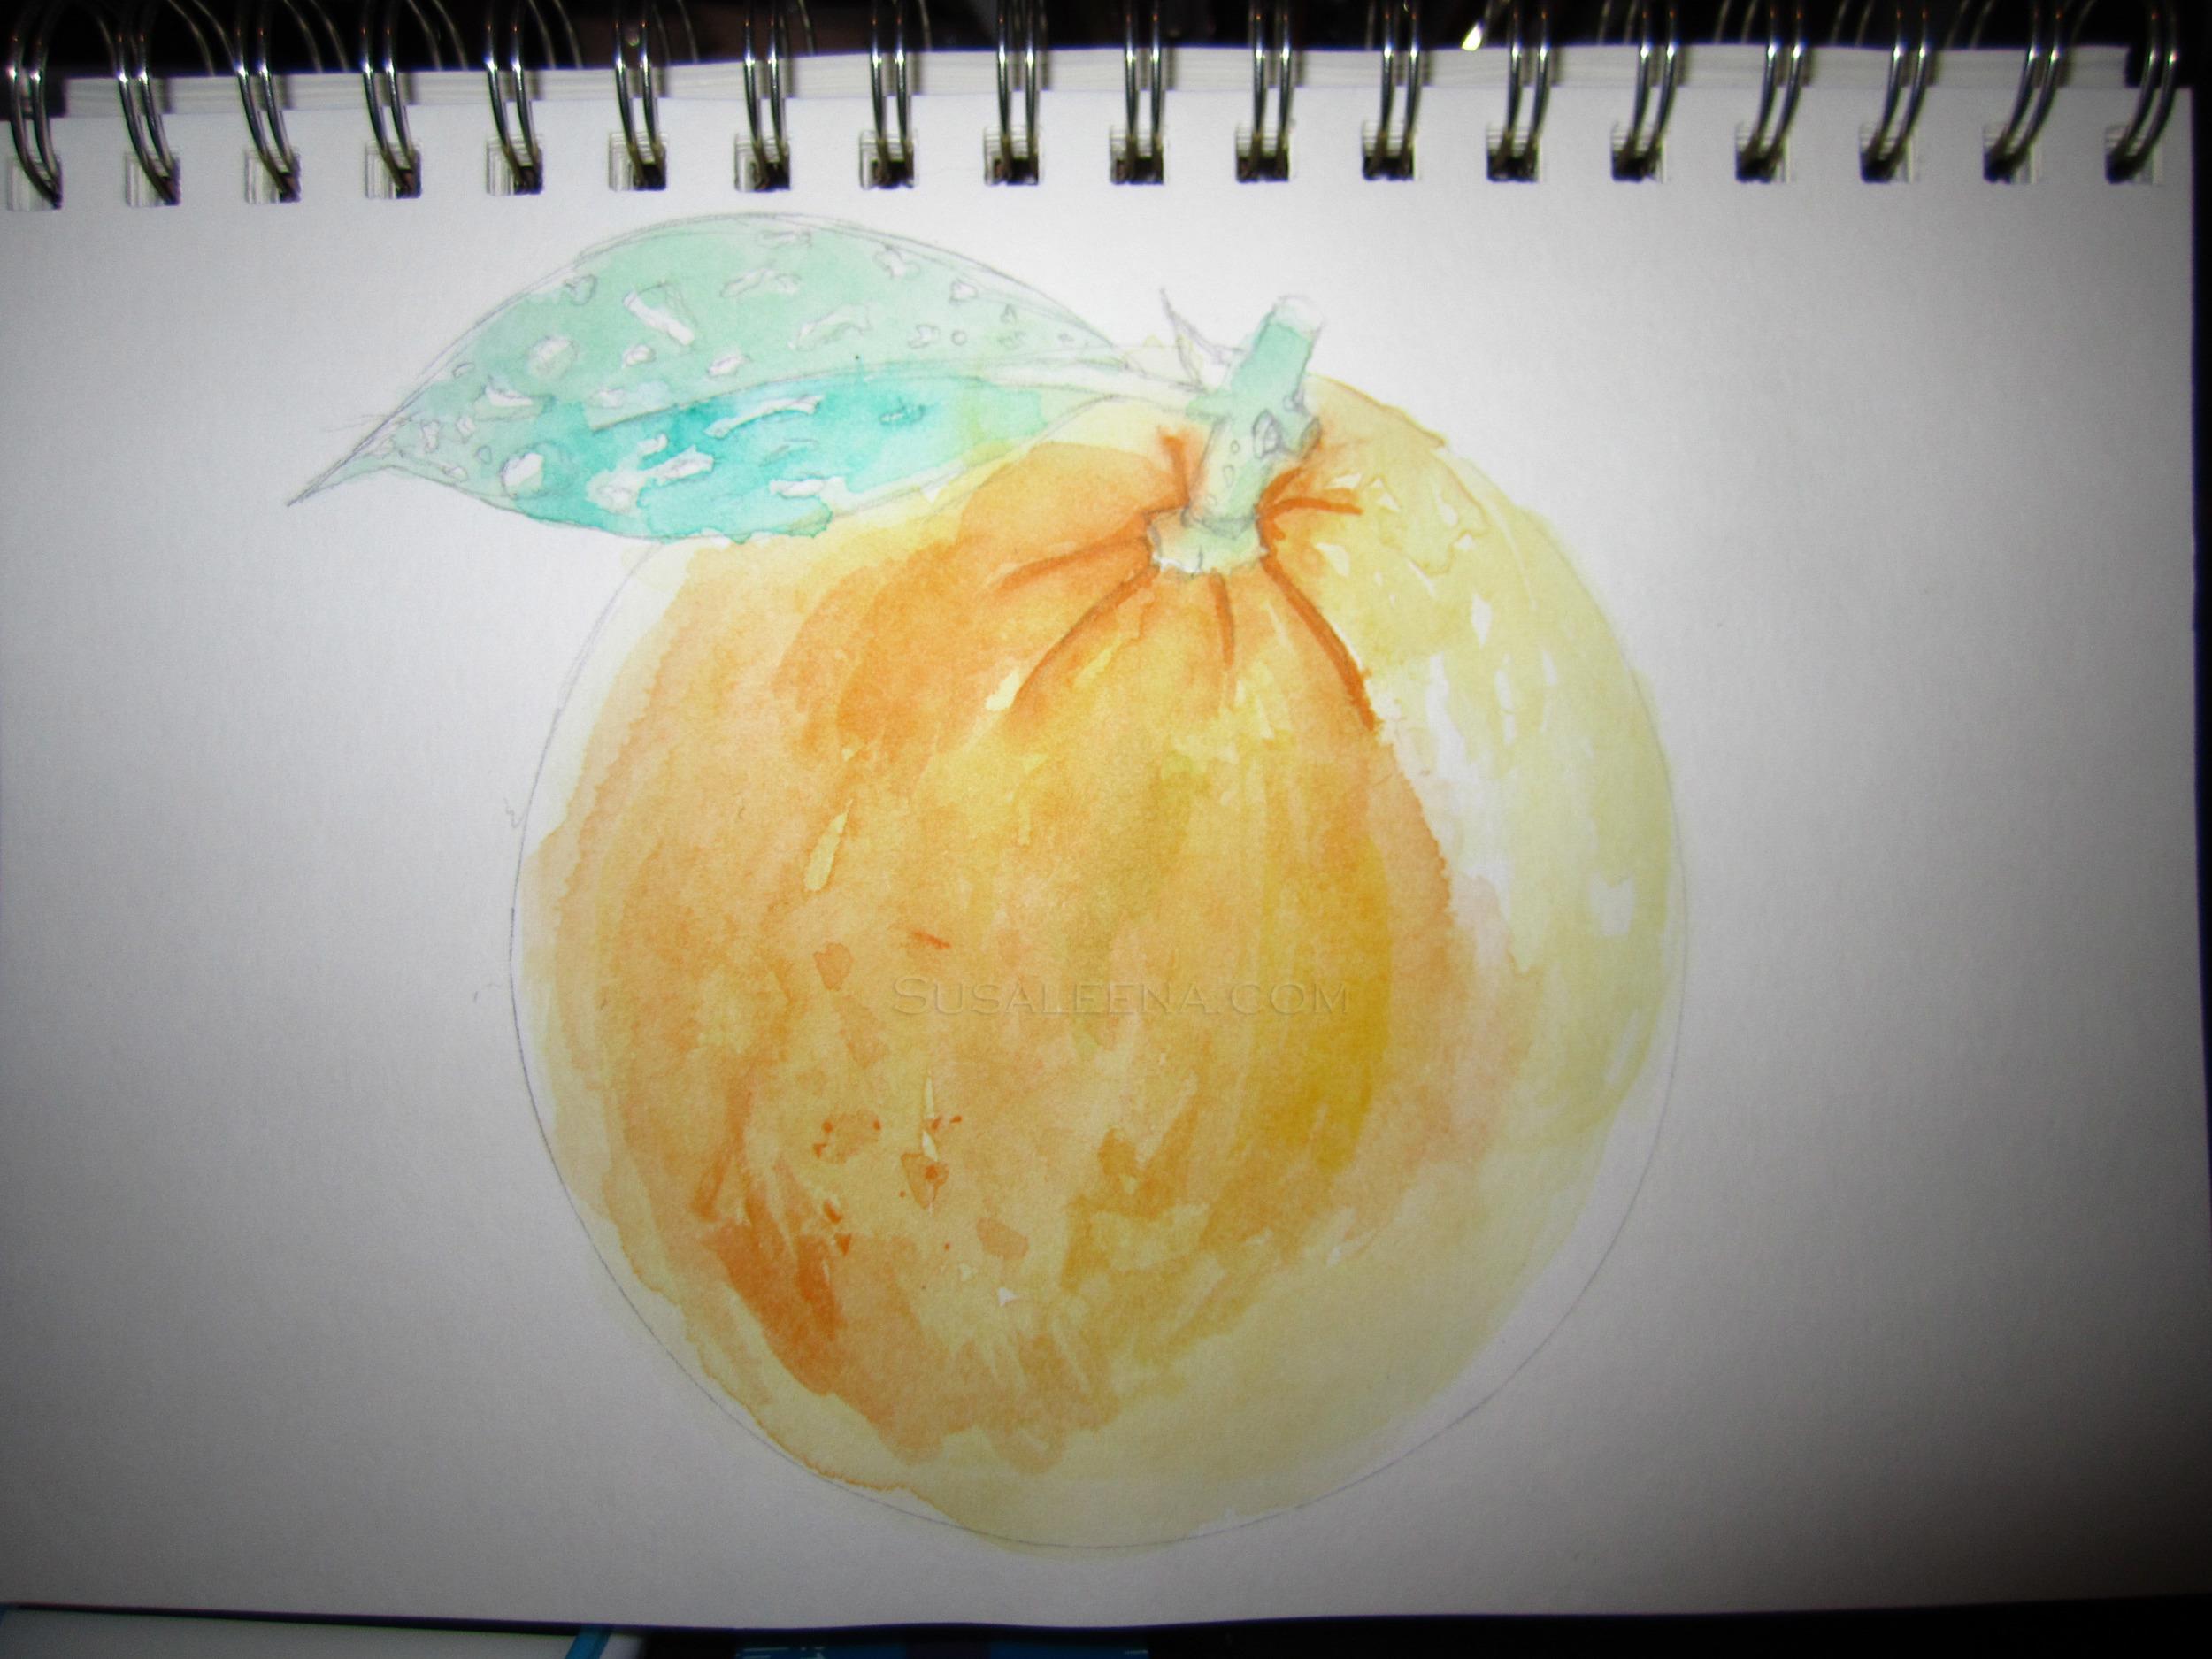 My 5min doodle of an orange